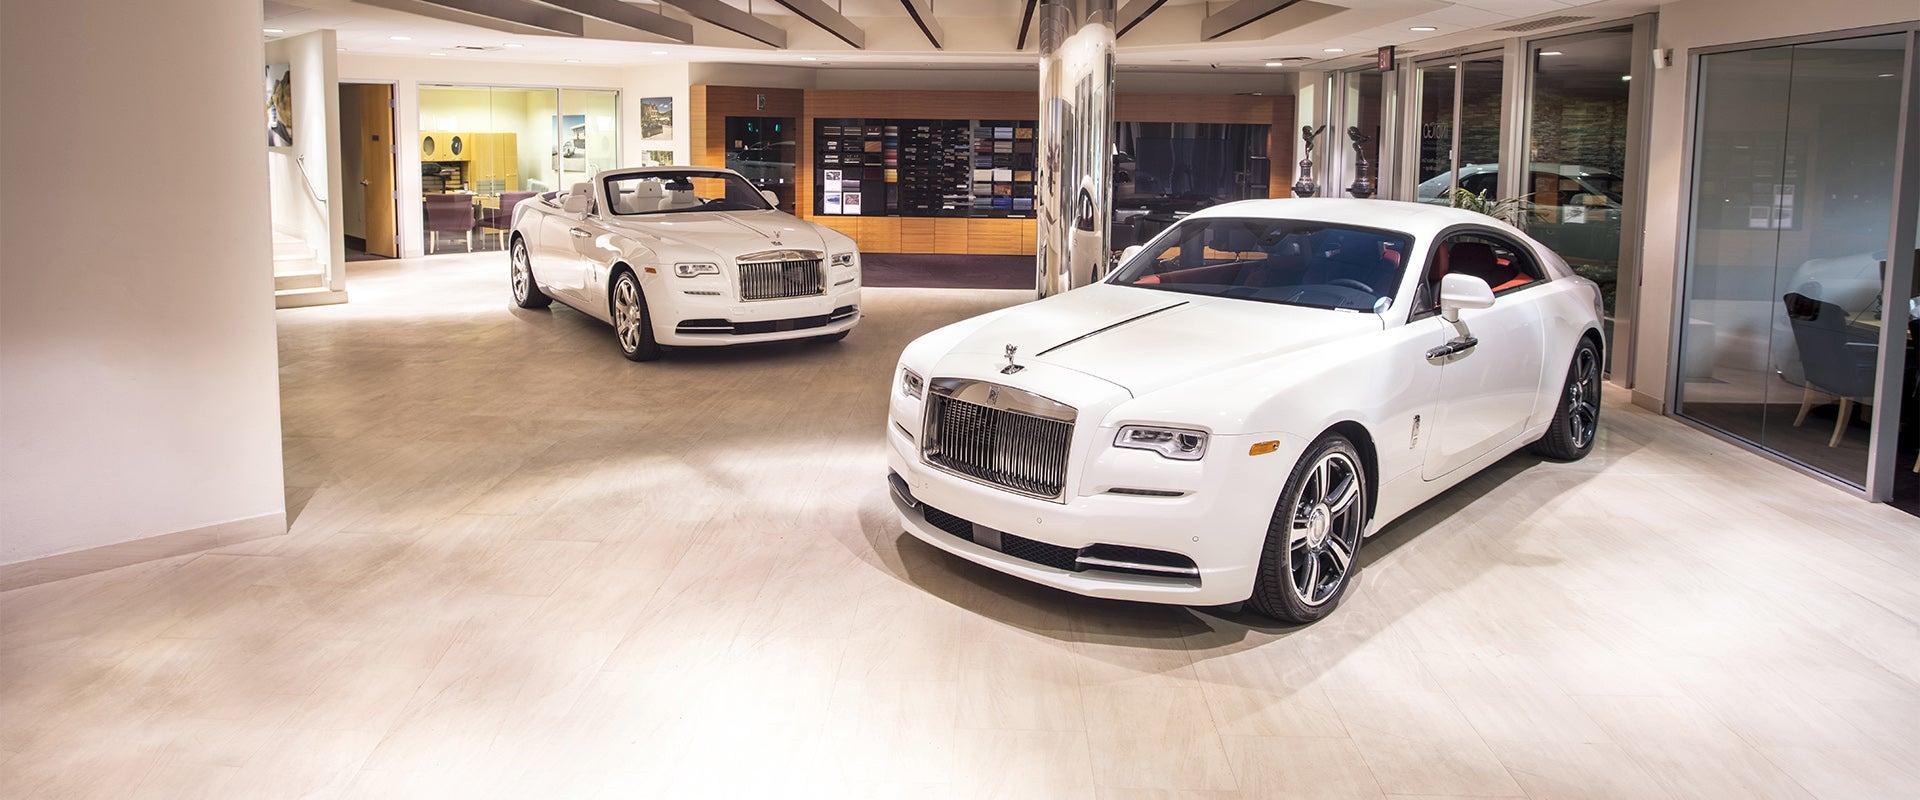 Rolls Royce Dealers >> New Pre Owned Rolls Royce Dealership Rancho Mirage Ca